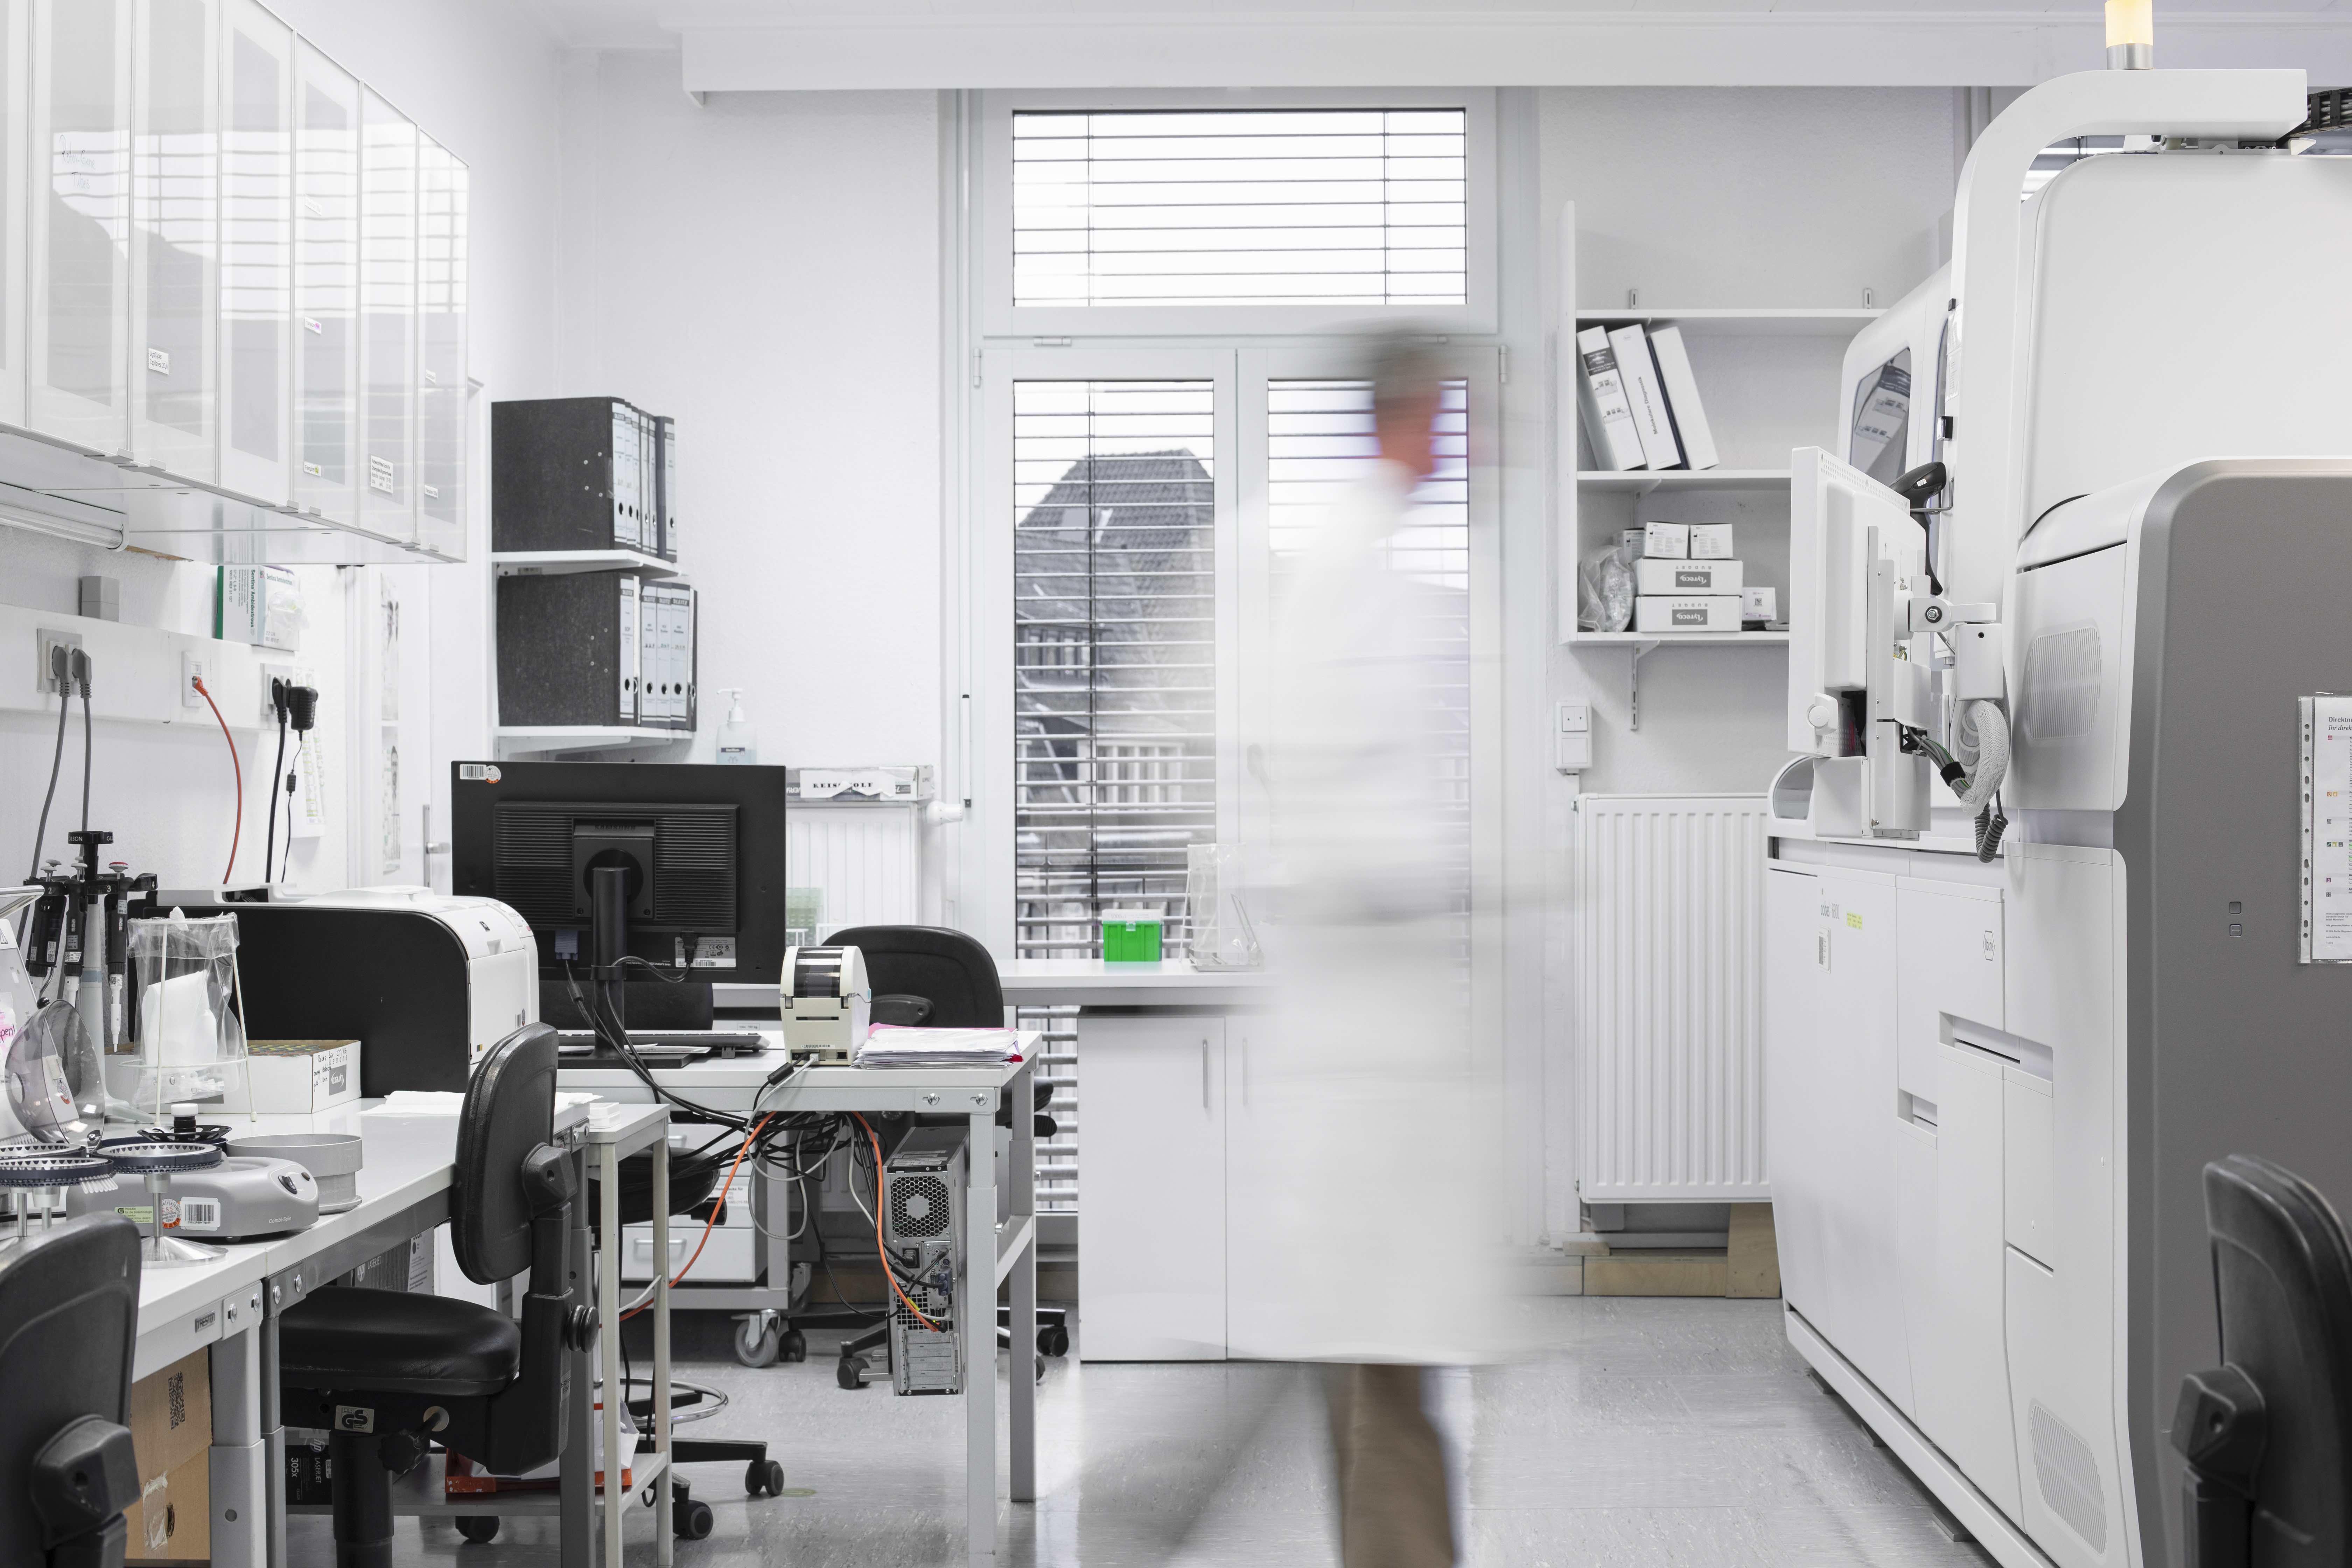 Komplettpaket Rücksendeset + PCR Laboruntersuchung SARS-CoV-2